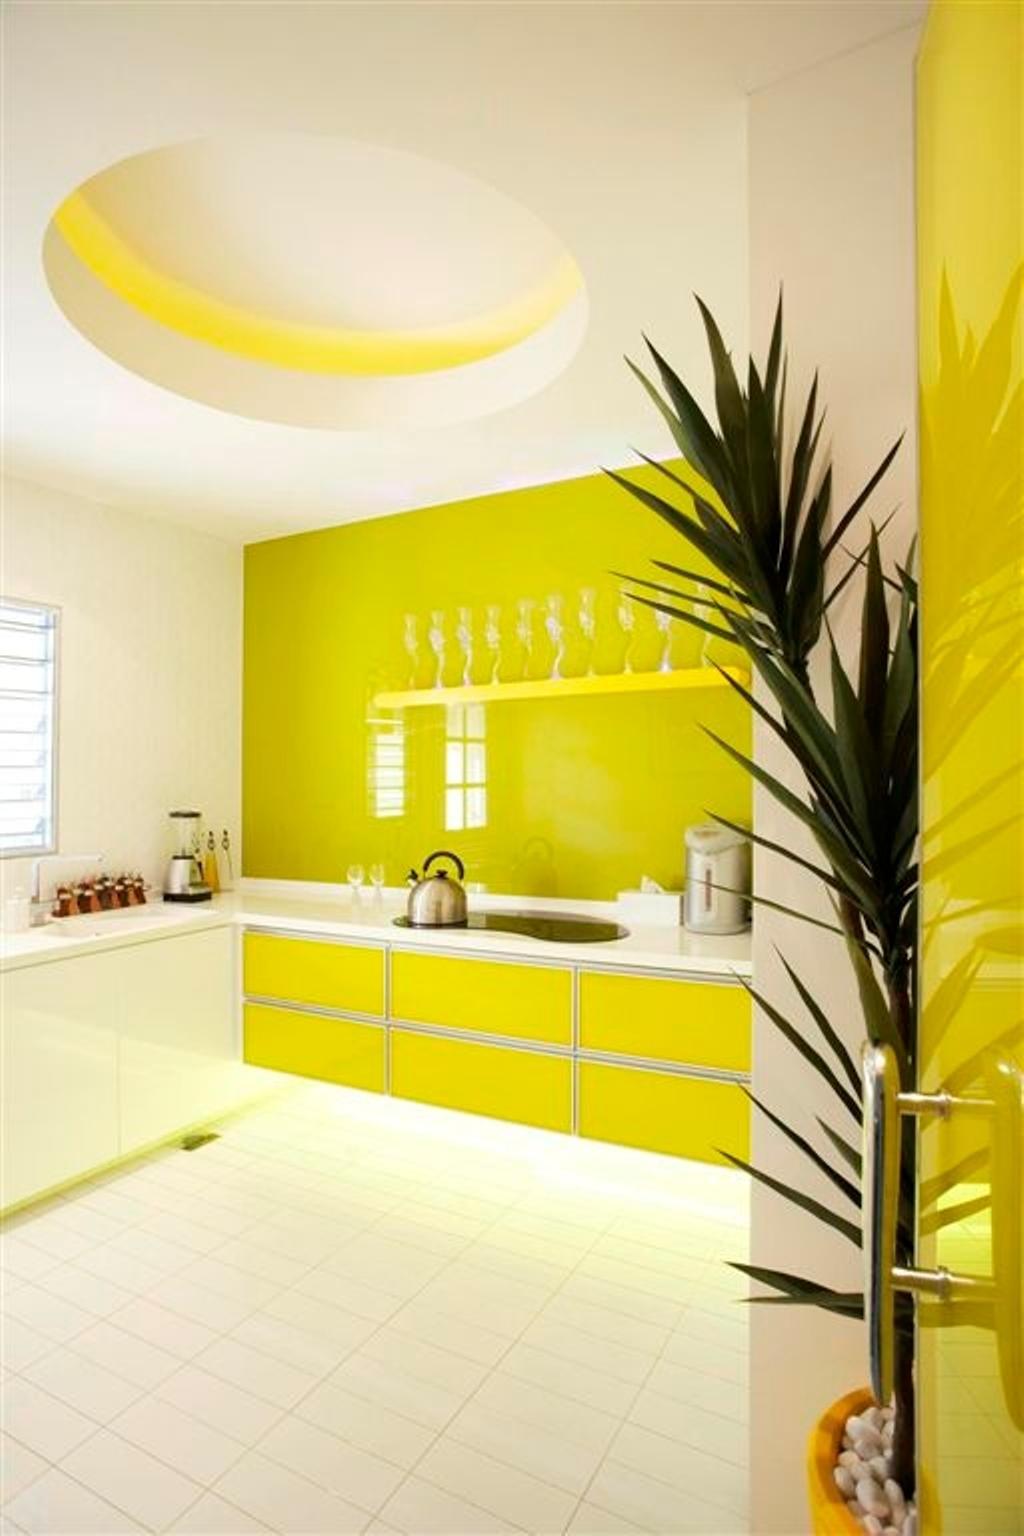 Transitional, Landed, Kitchen, Sembawang, Interior Designer, Free Space Intent, Bathroom, Indoors, Interior Design, Room